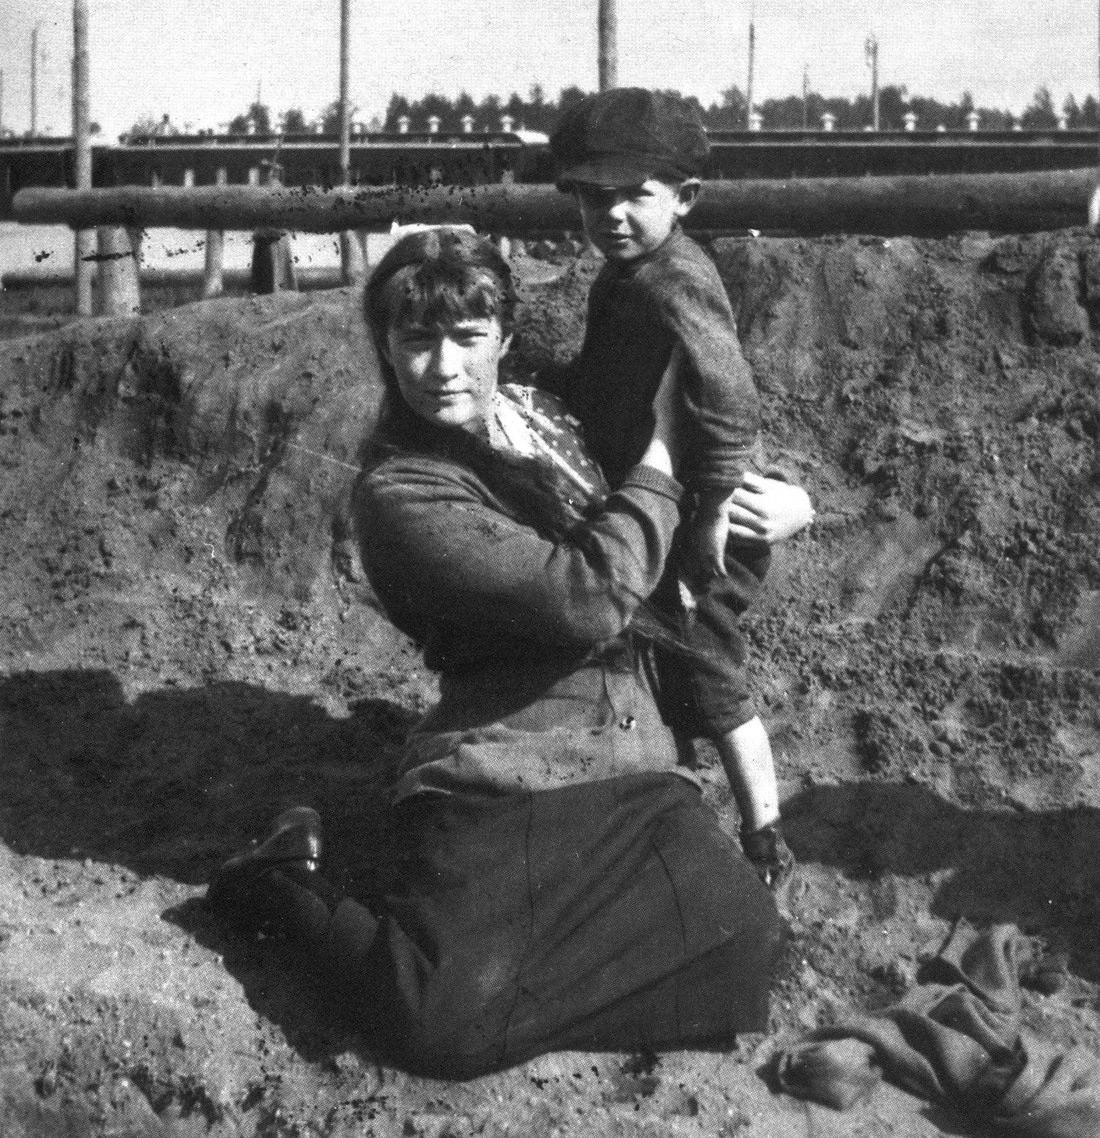 File:Anastasia hugging a boy.jpg - Wikimedia Commons